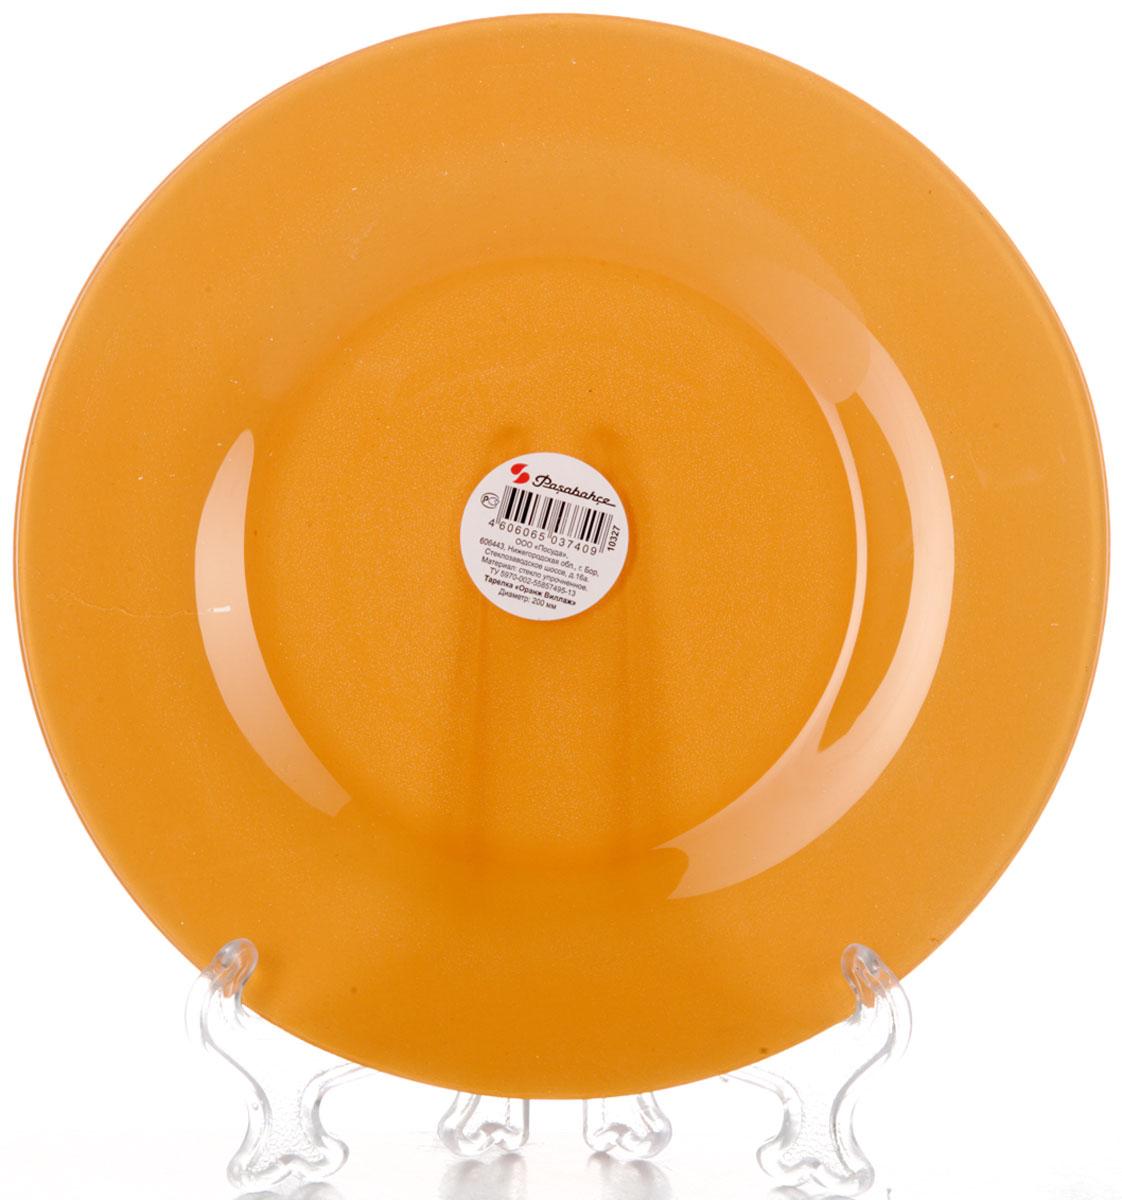 Тарелка Pasabahce Оранж Виллаж, цвет: оранжевый, диаметр 20 см тарелка десертная даржилинг оранж 20 5 см 861123